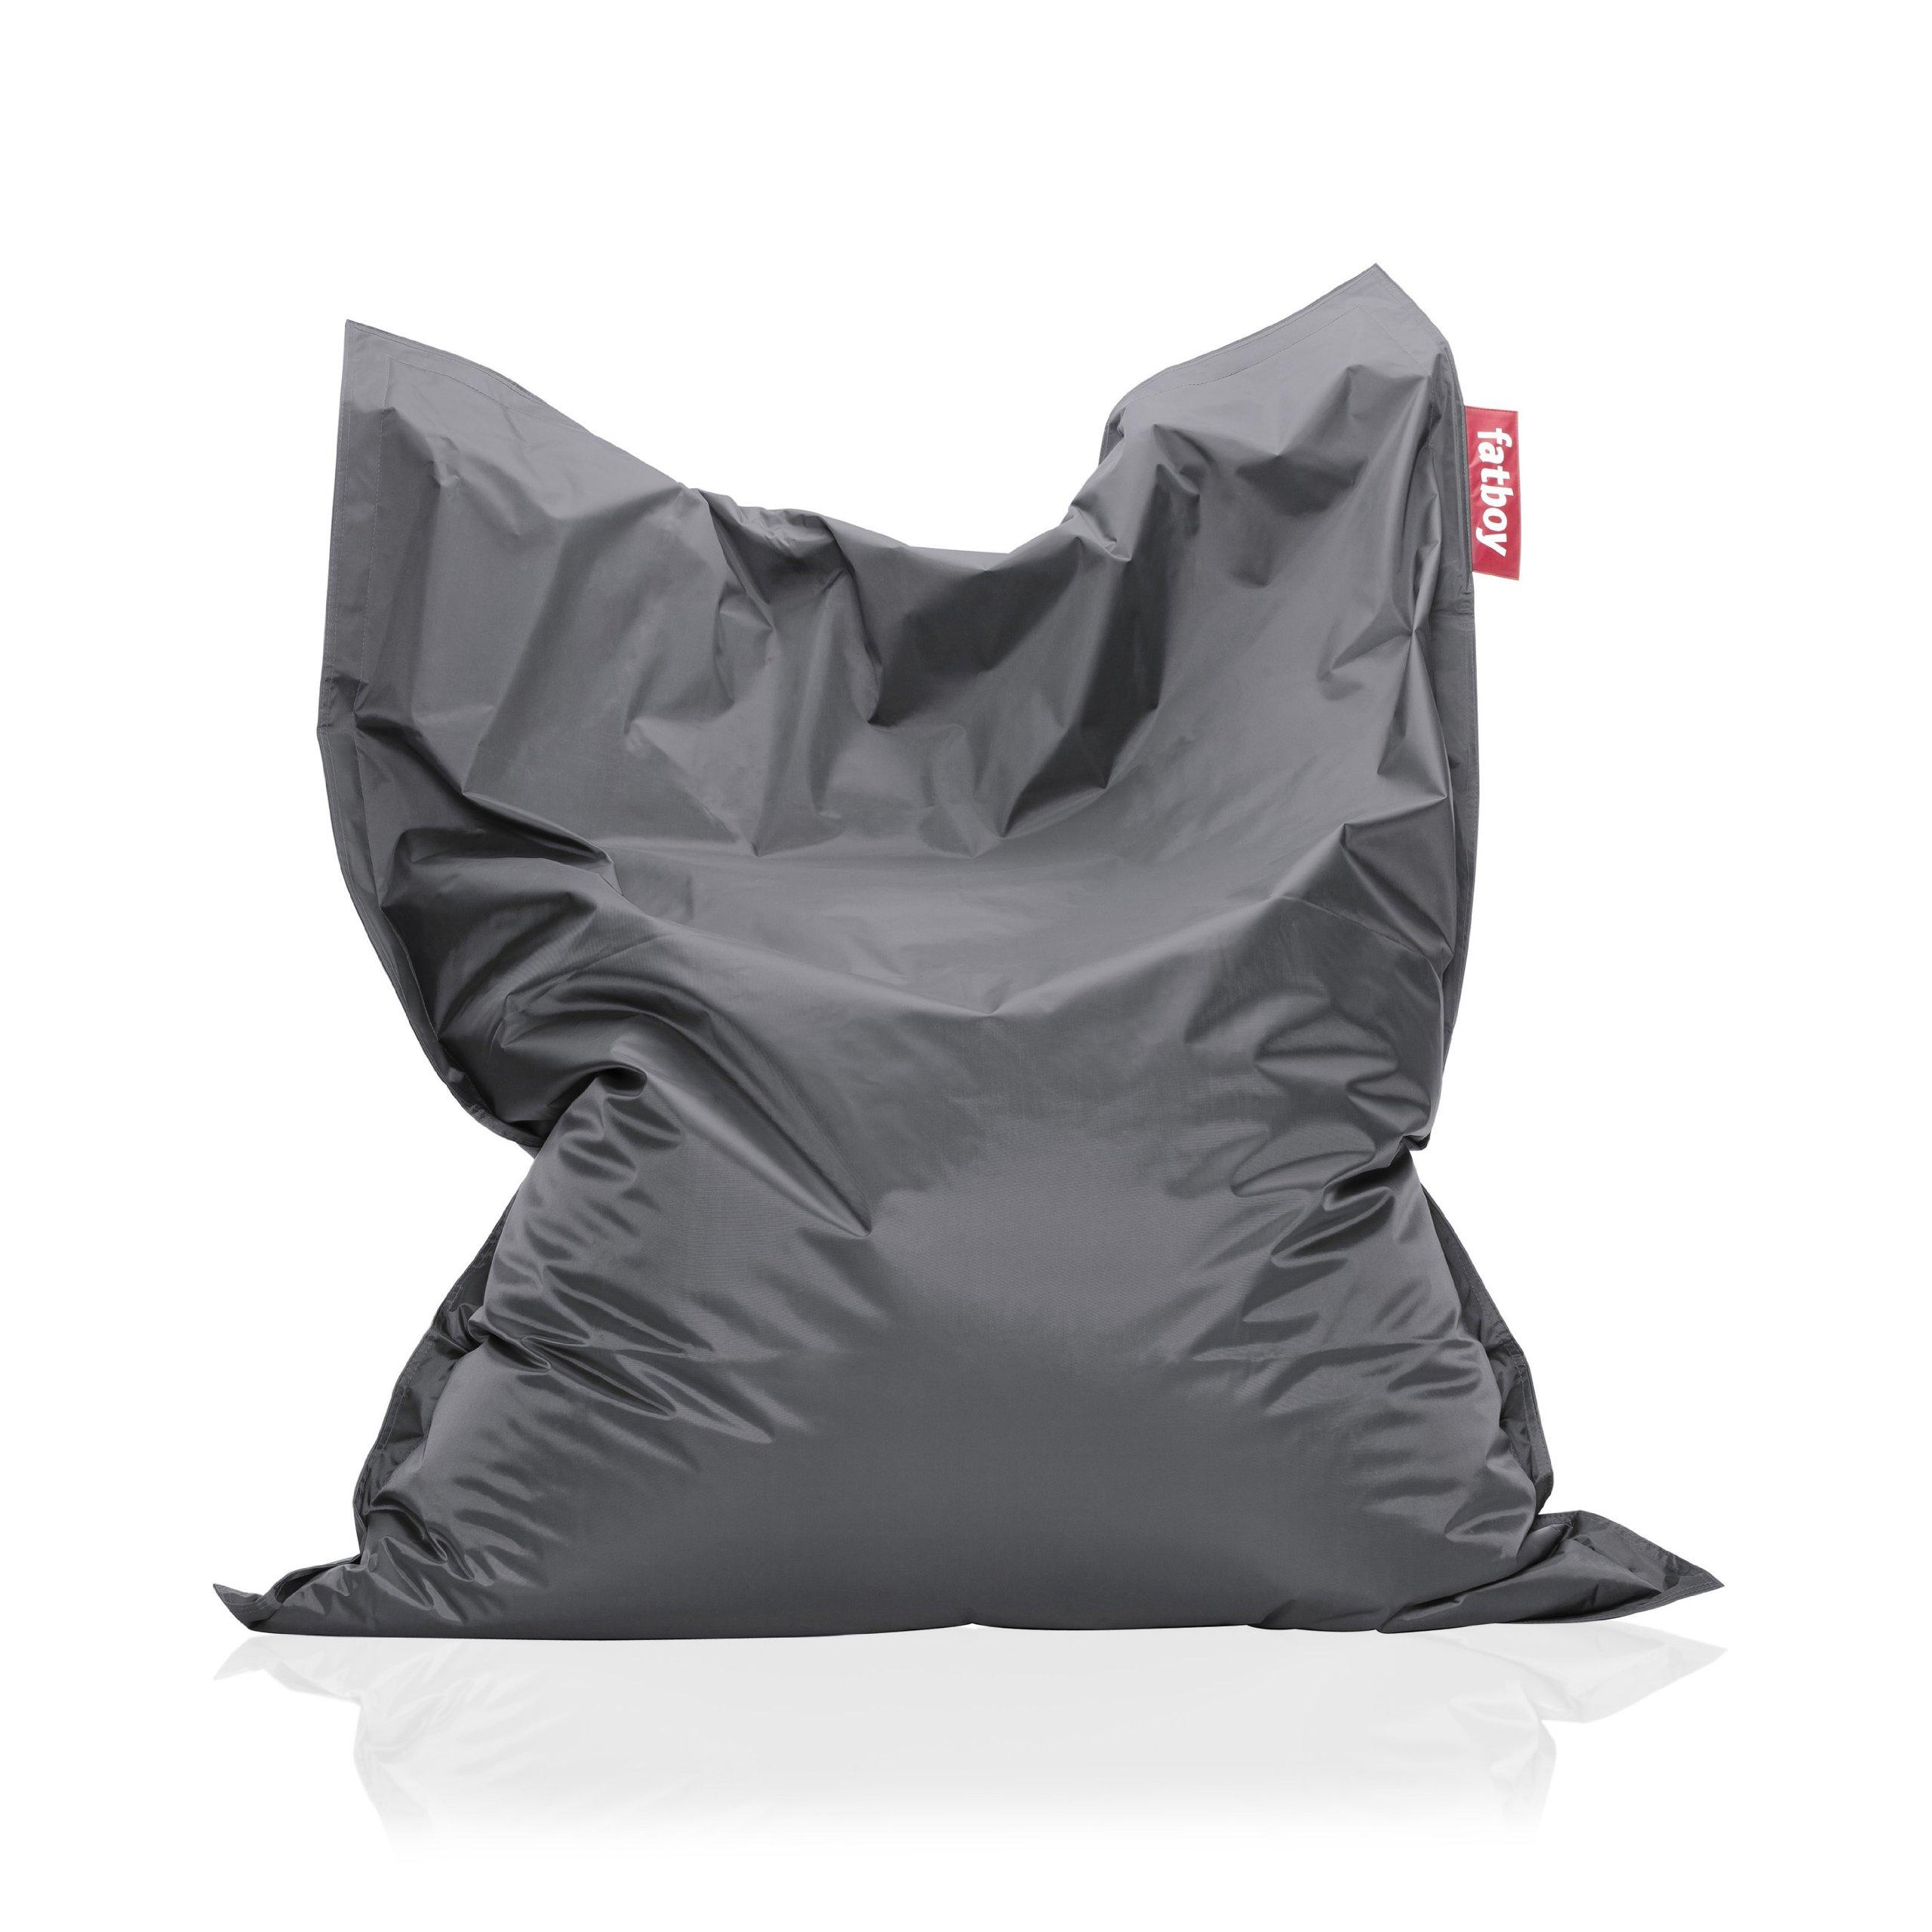 Fatboy The Original Bean Bag Chair - Dark Grey